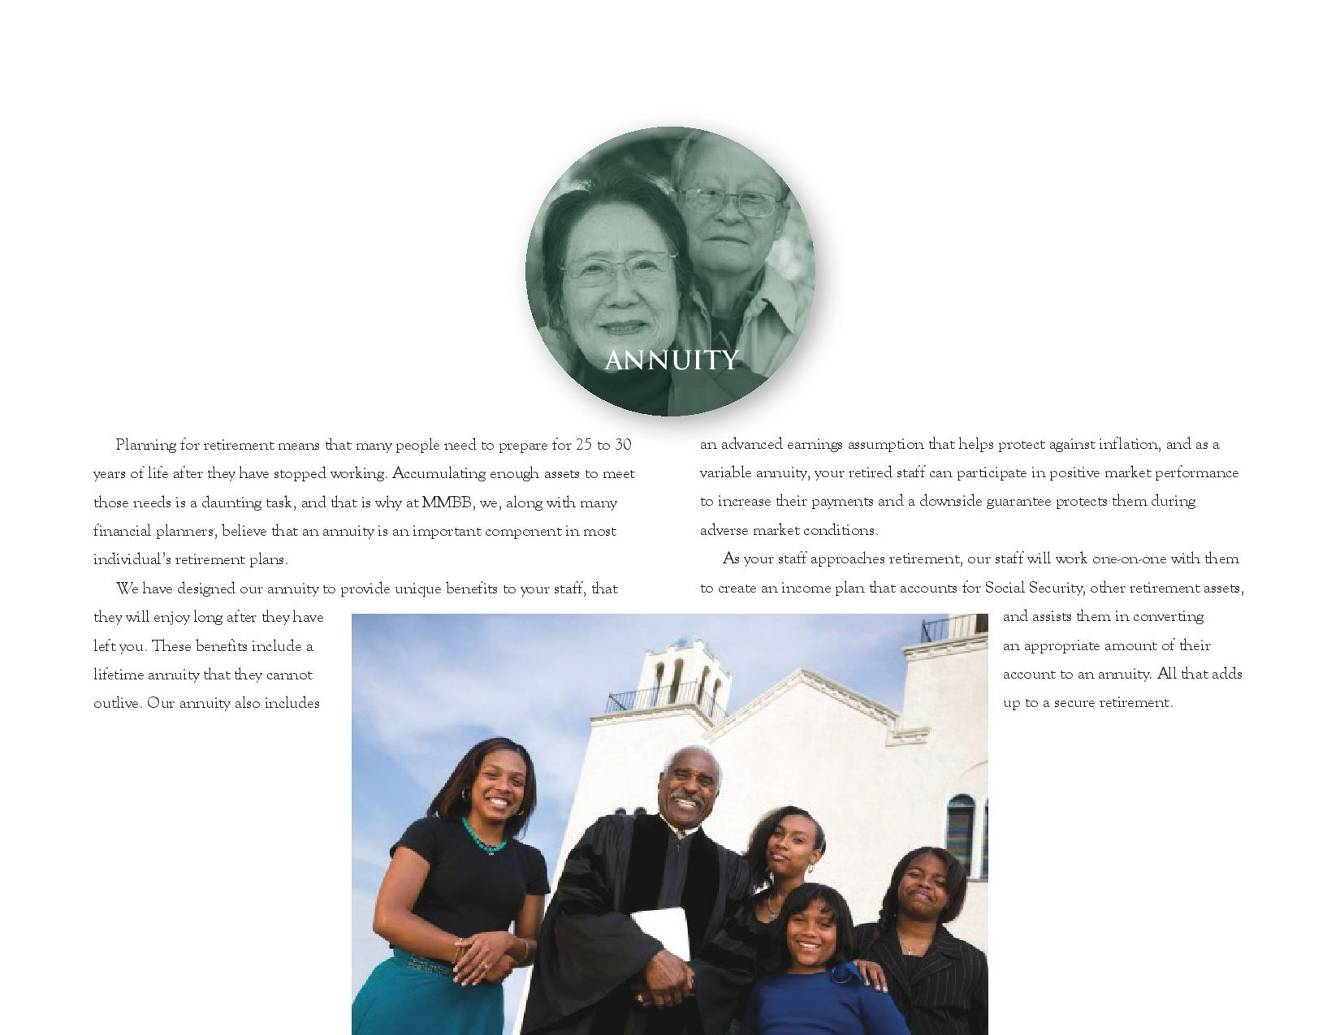 MMBB-Executive-Brochure-page-6_2x.jpg